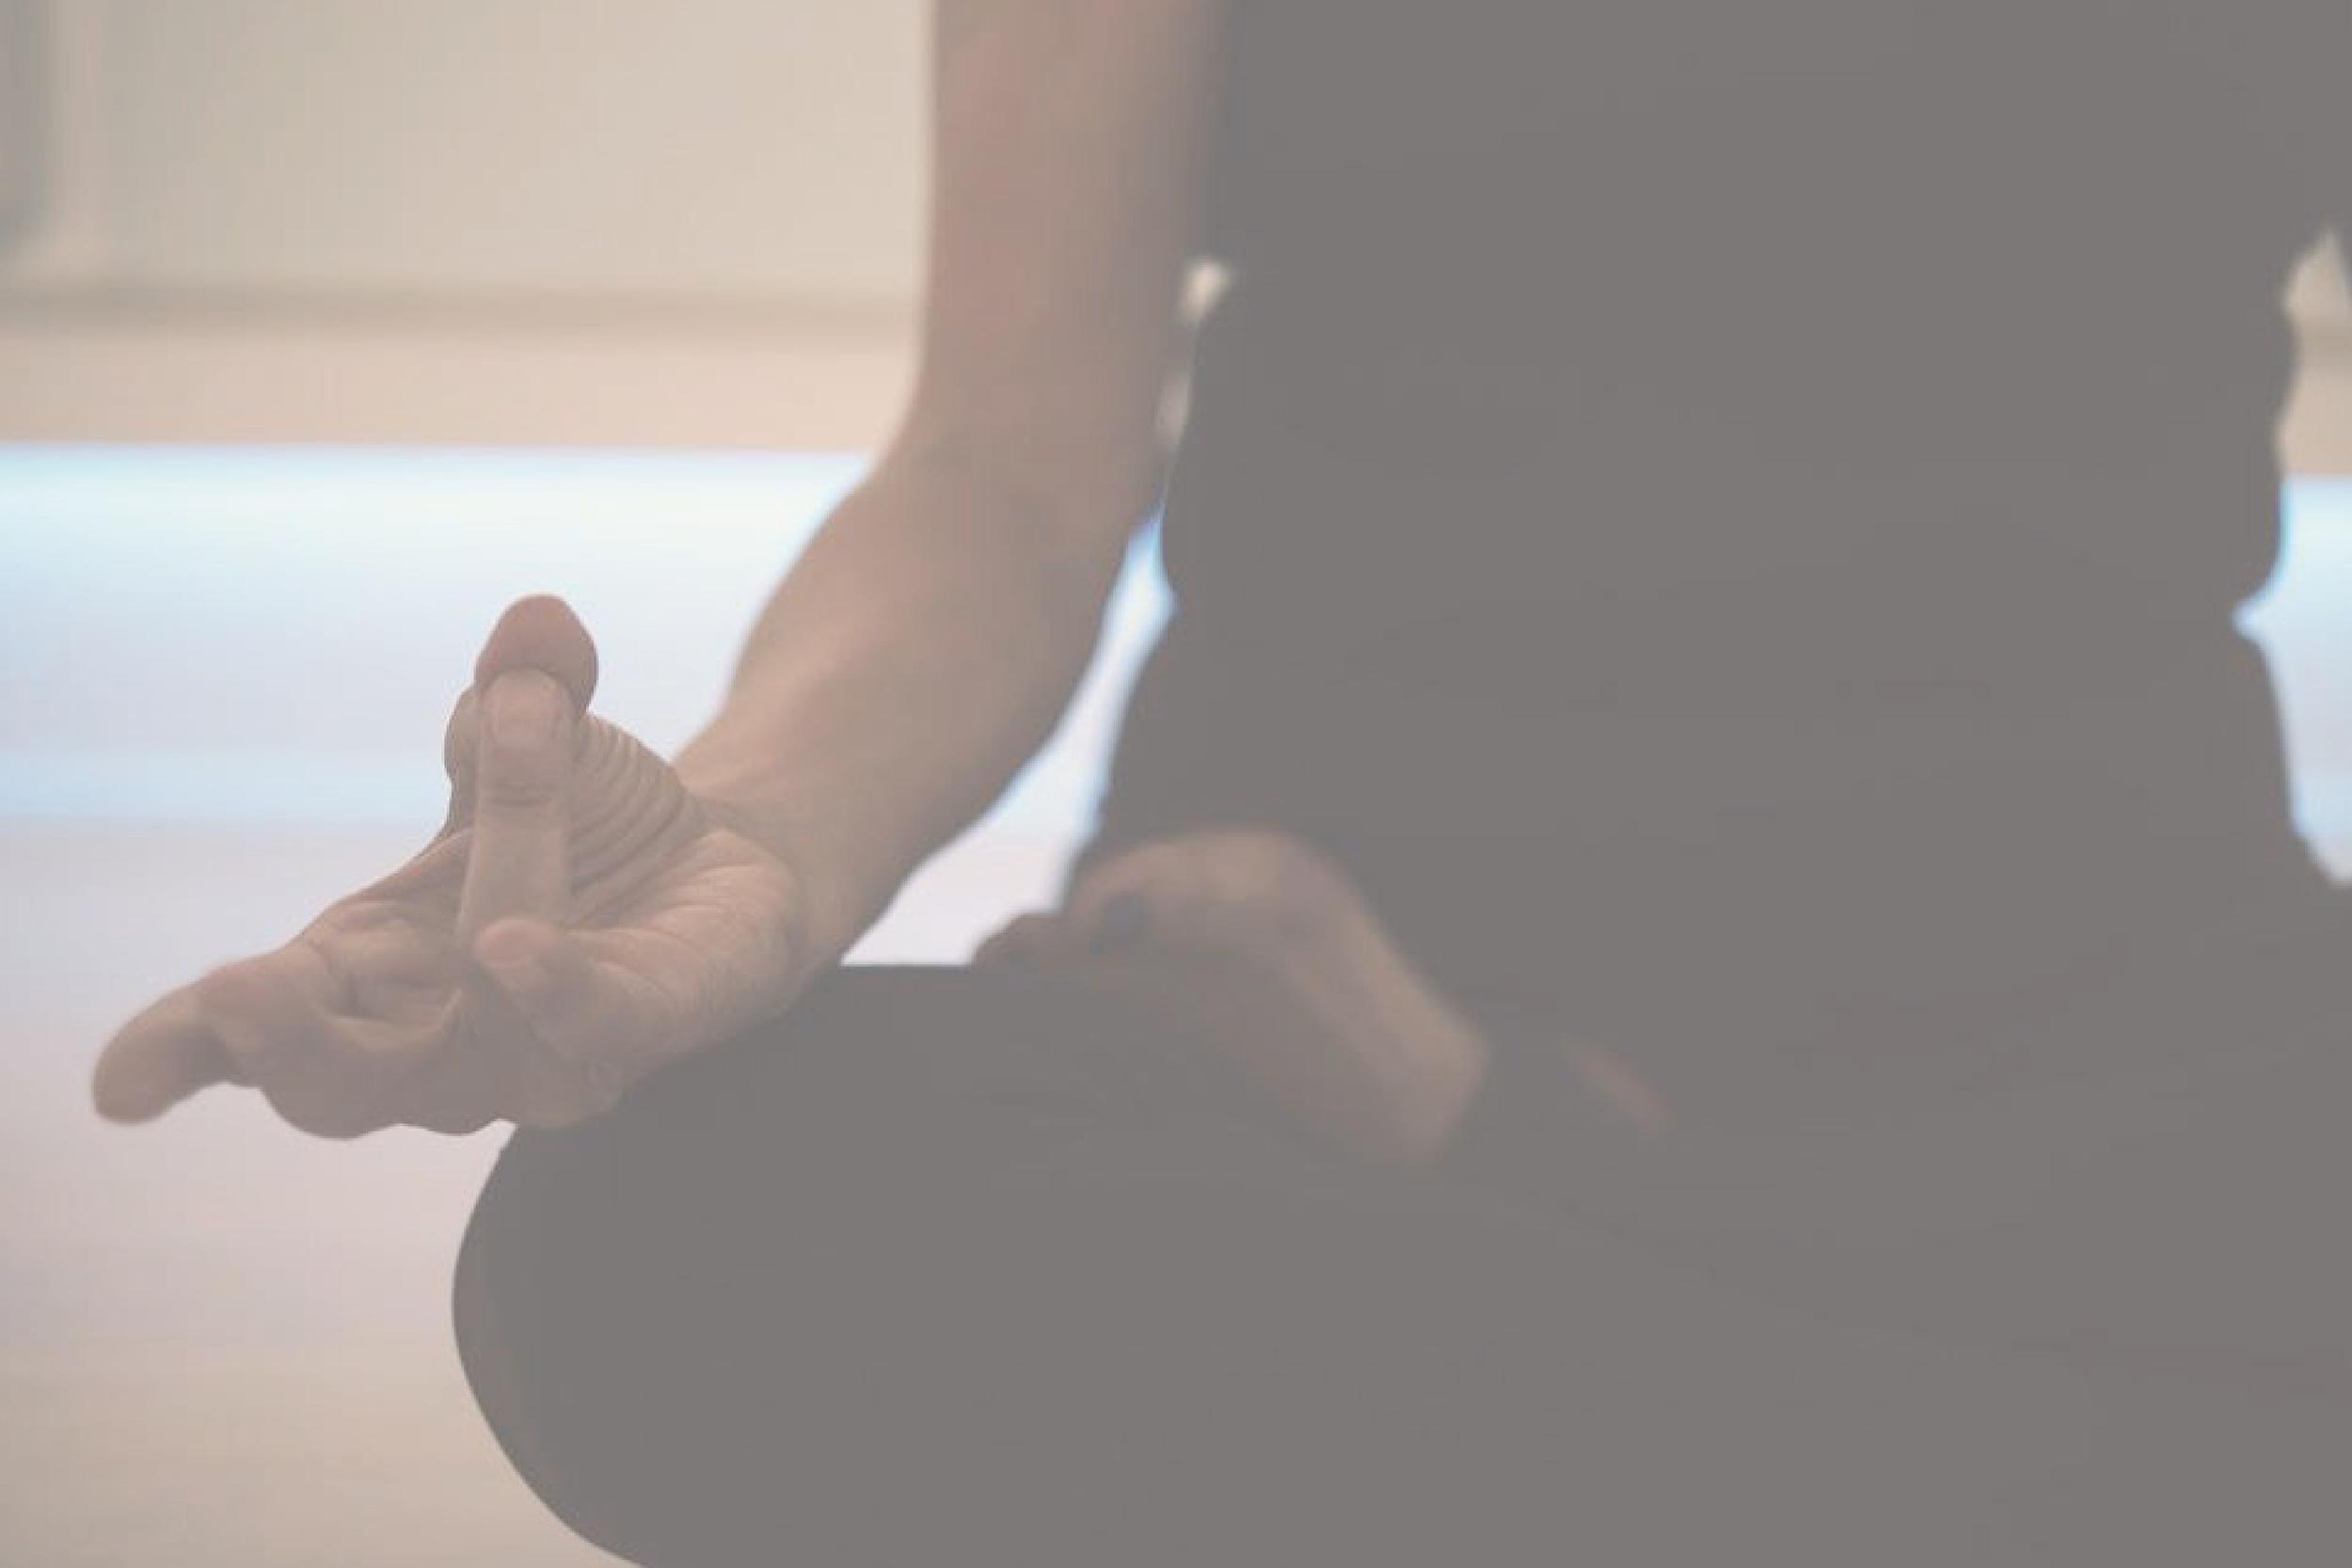 På billedet ses en meditationsstilling